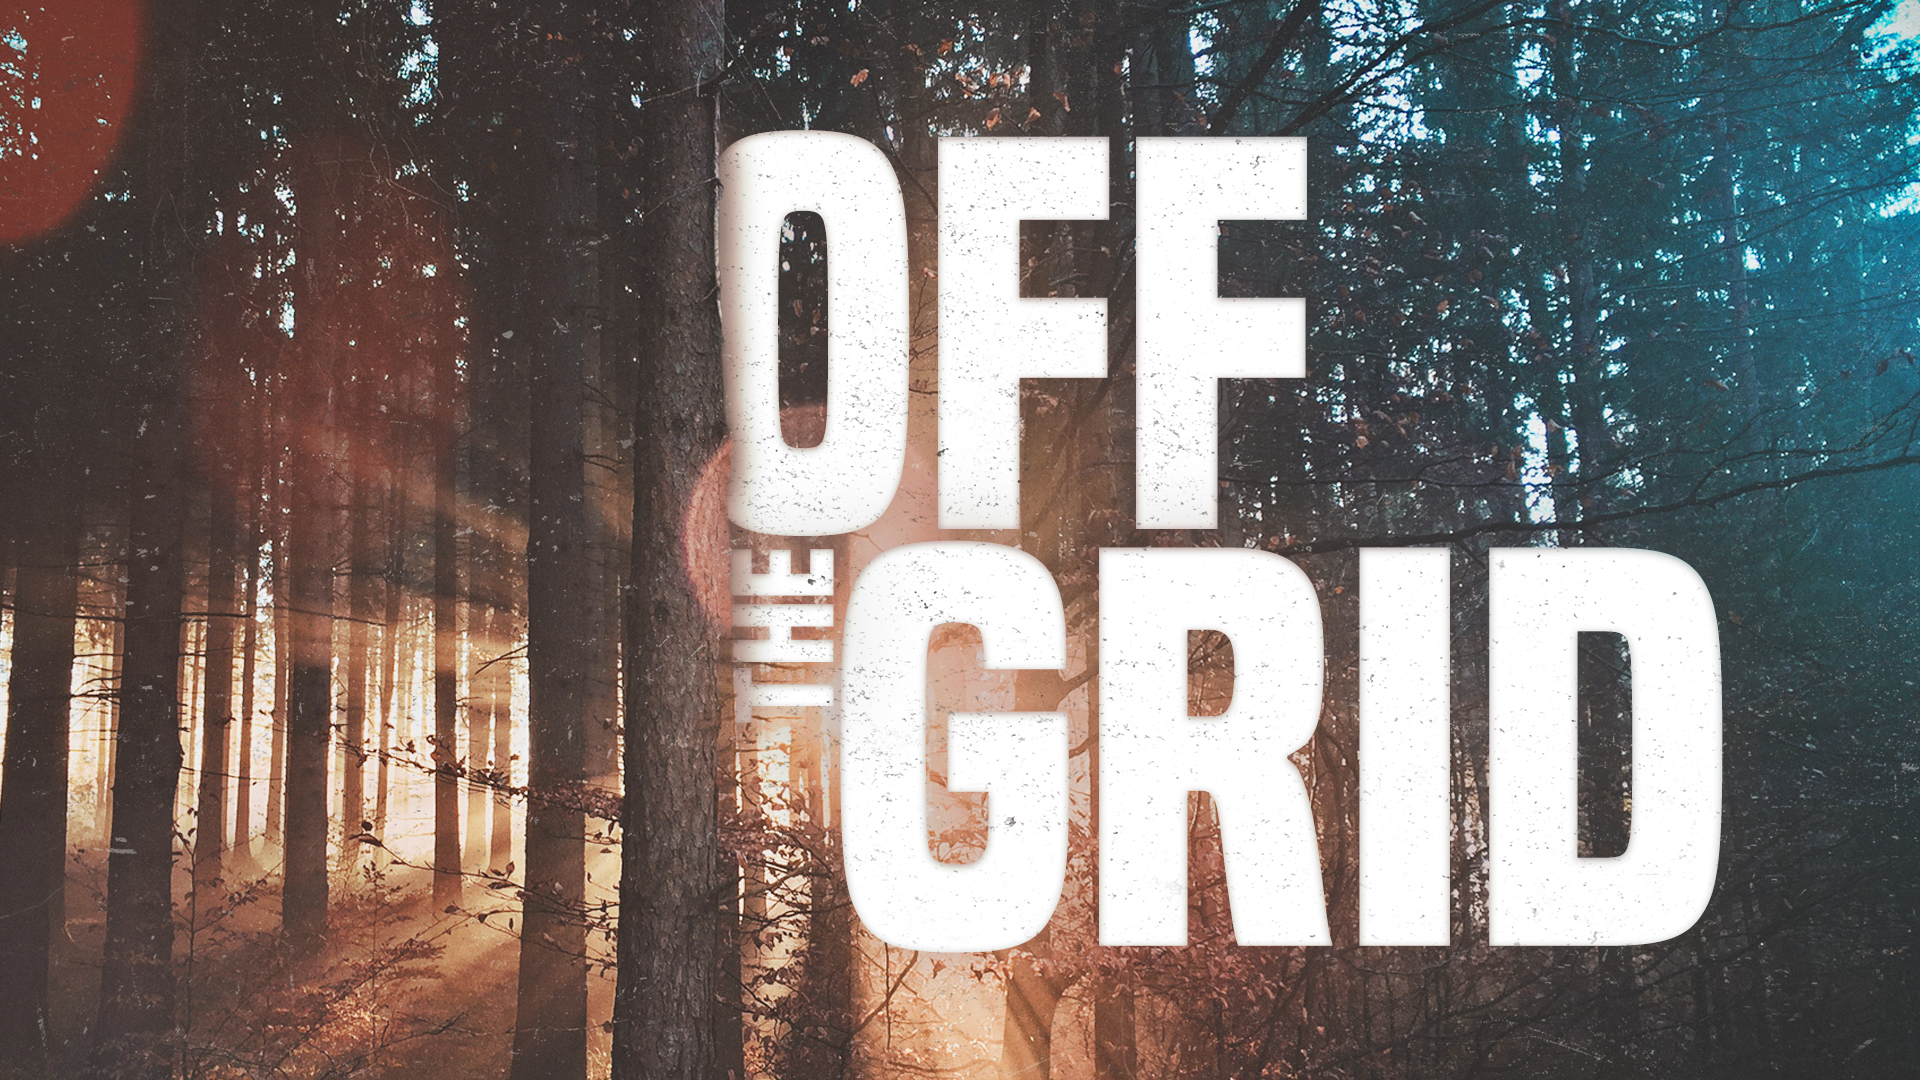 off-the-grid_1920x1080.JPG